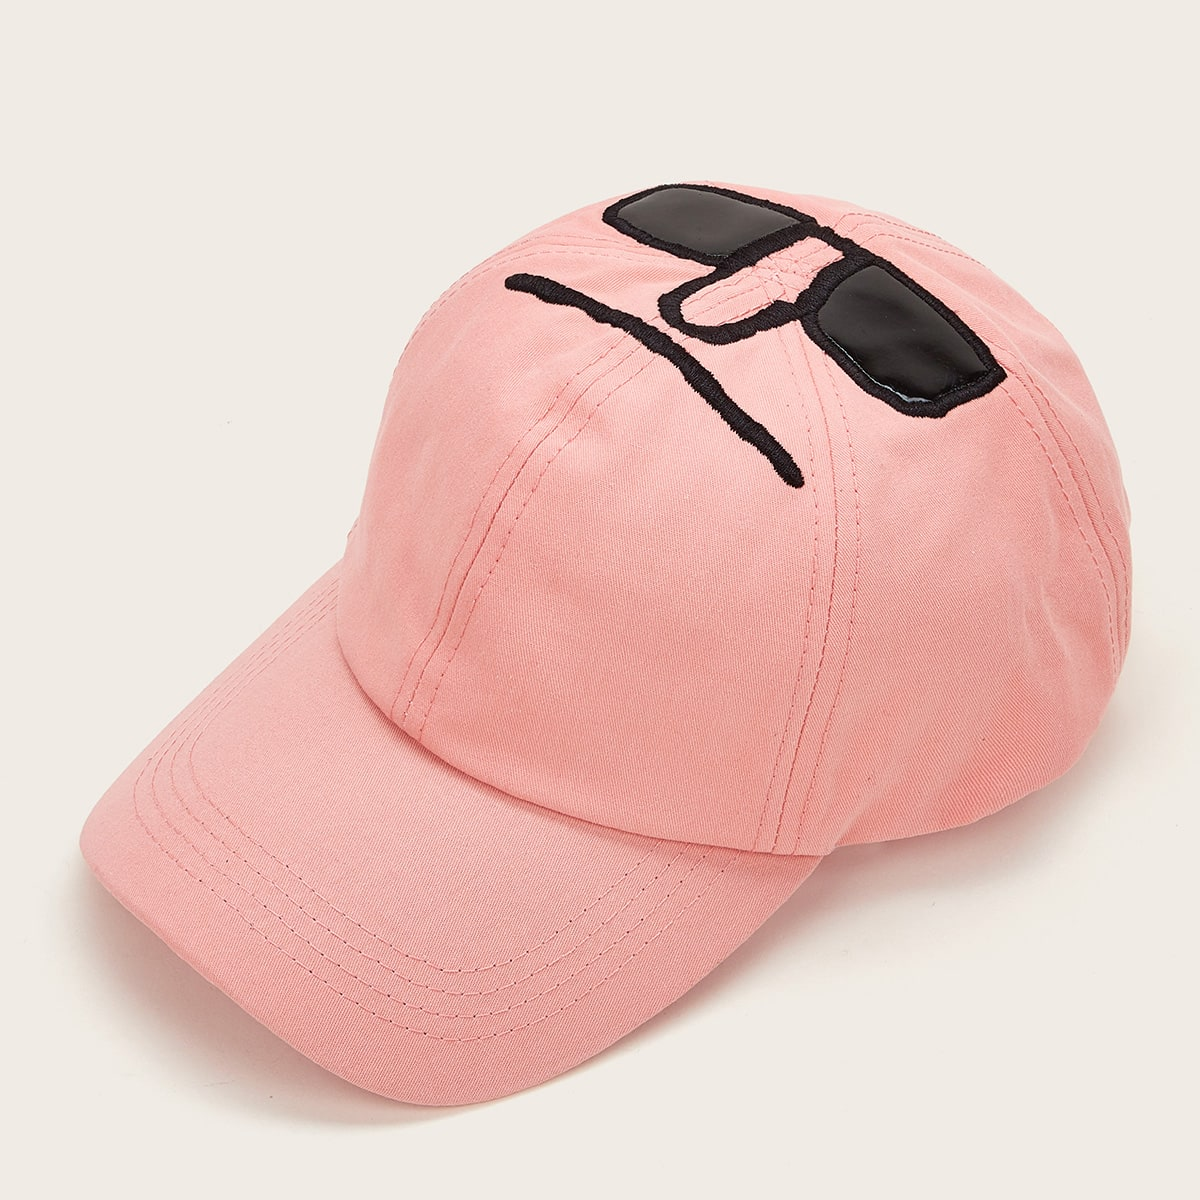 Heren zonnebril borduurwerk baseball cap